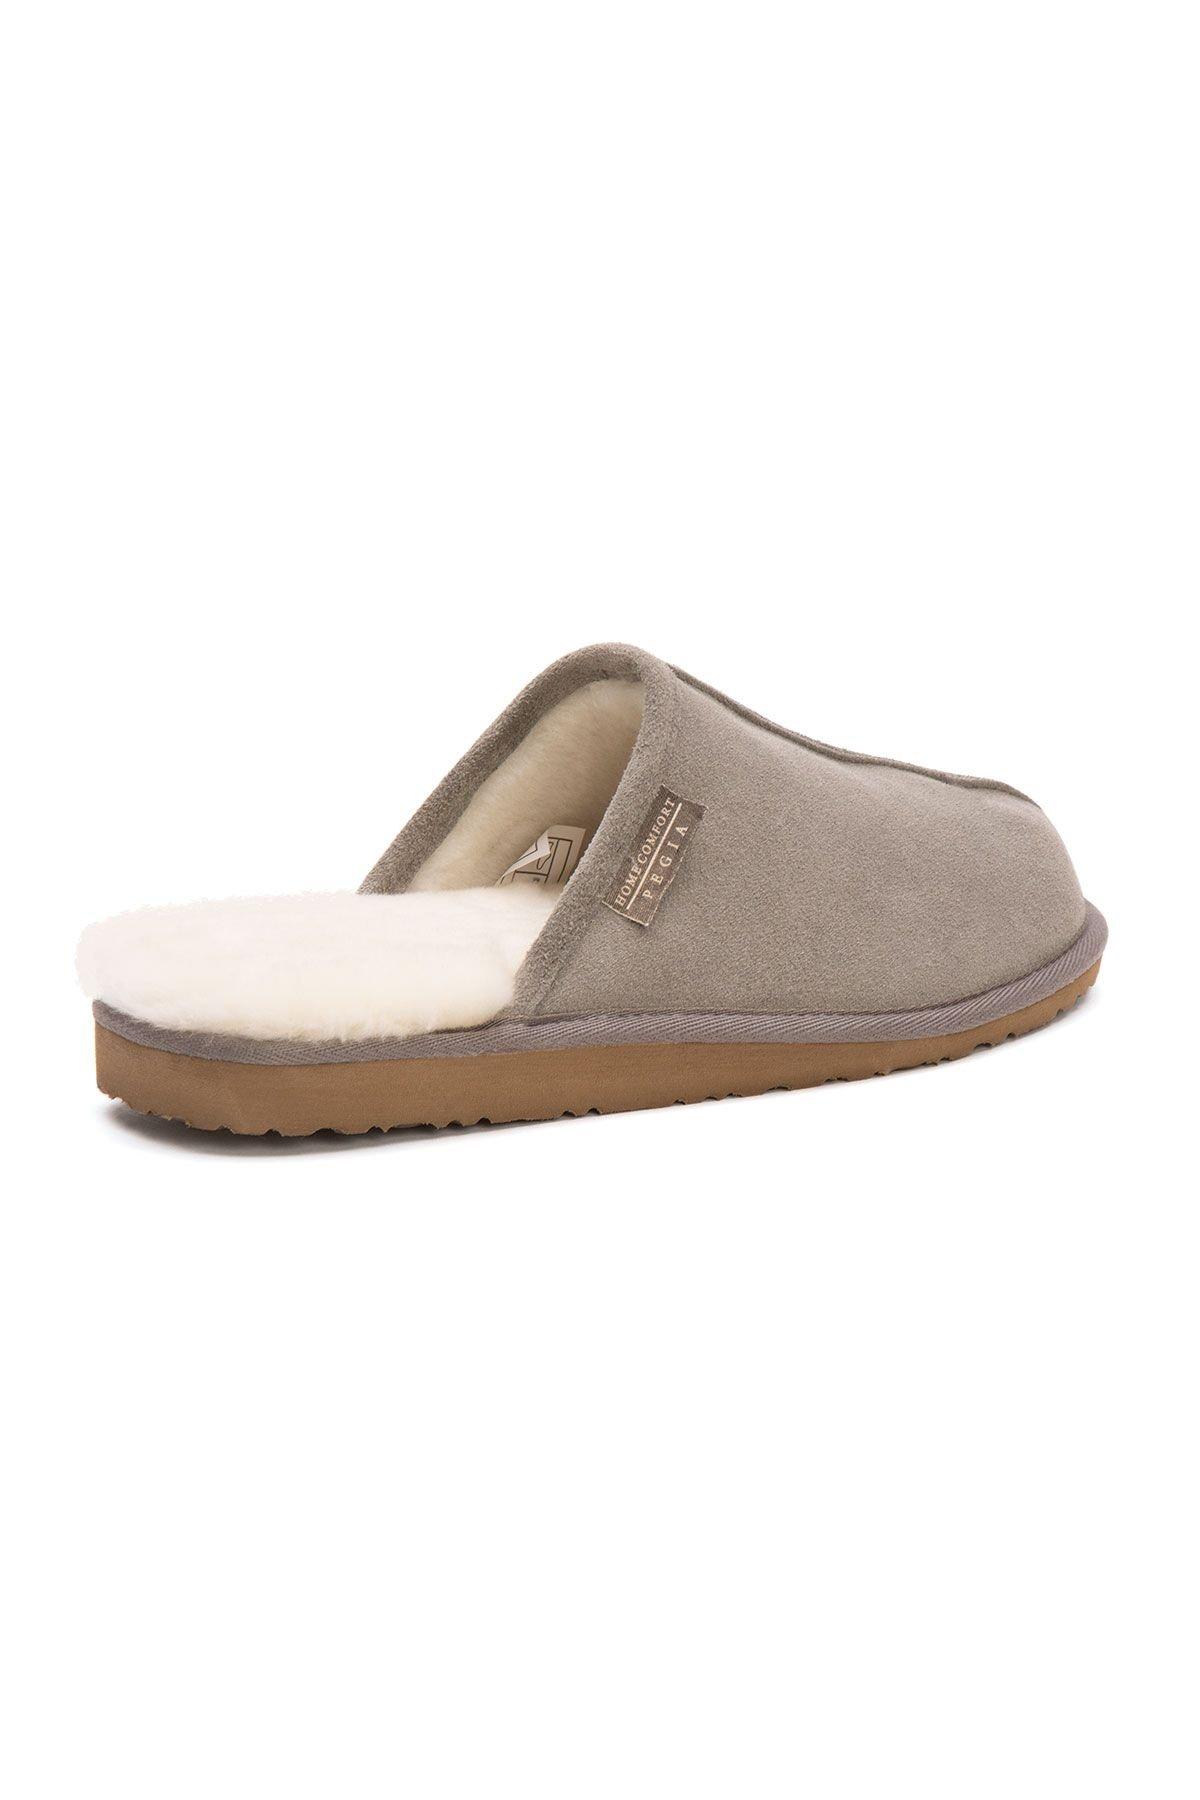 Pegia Shearling Men's House Slippers 111002 Gray